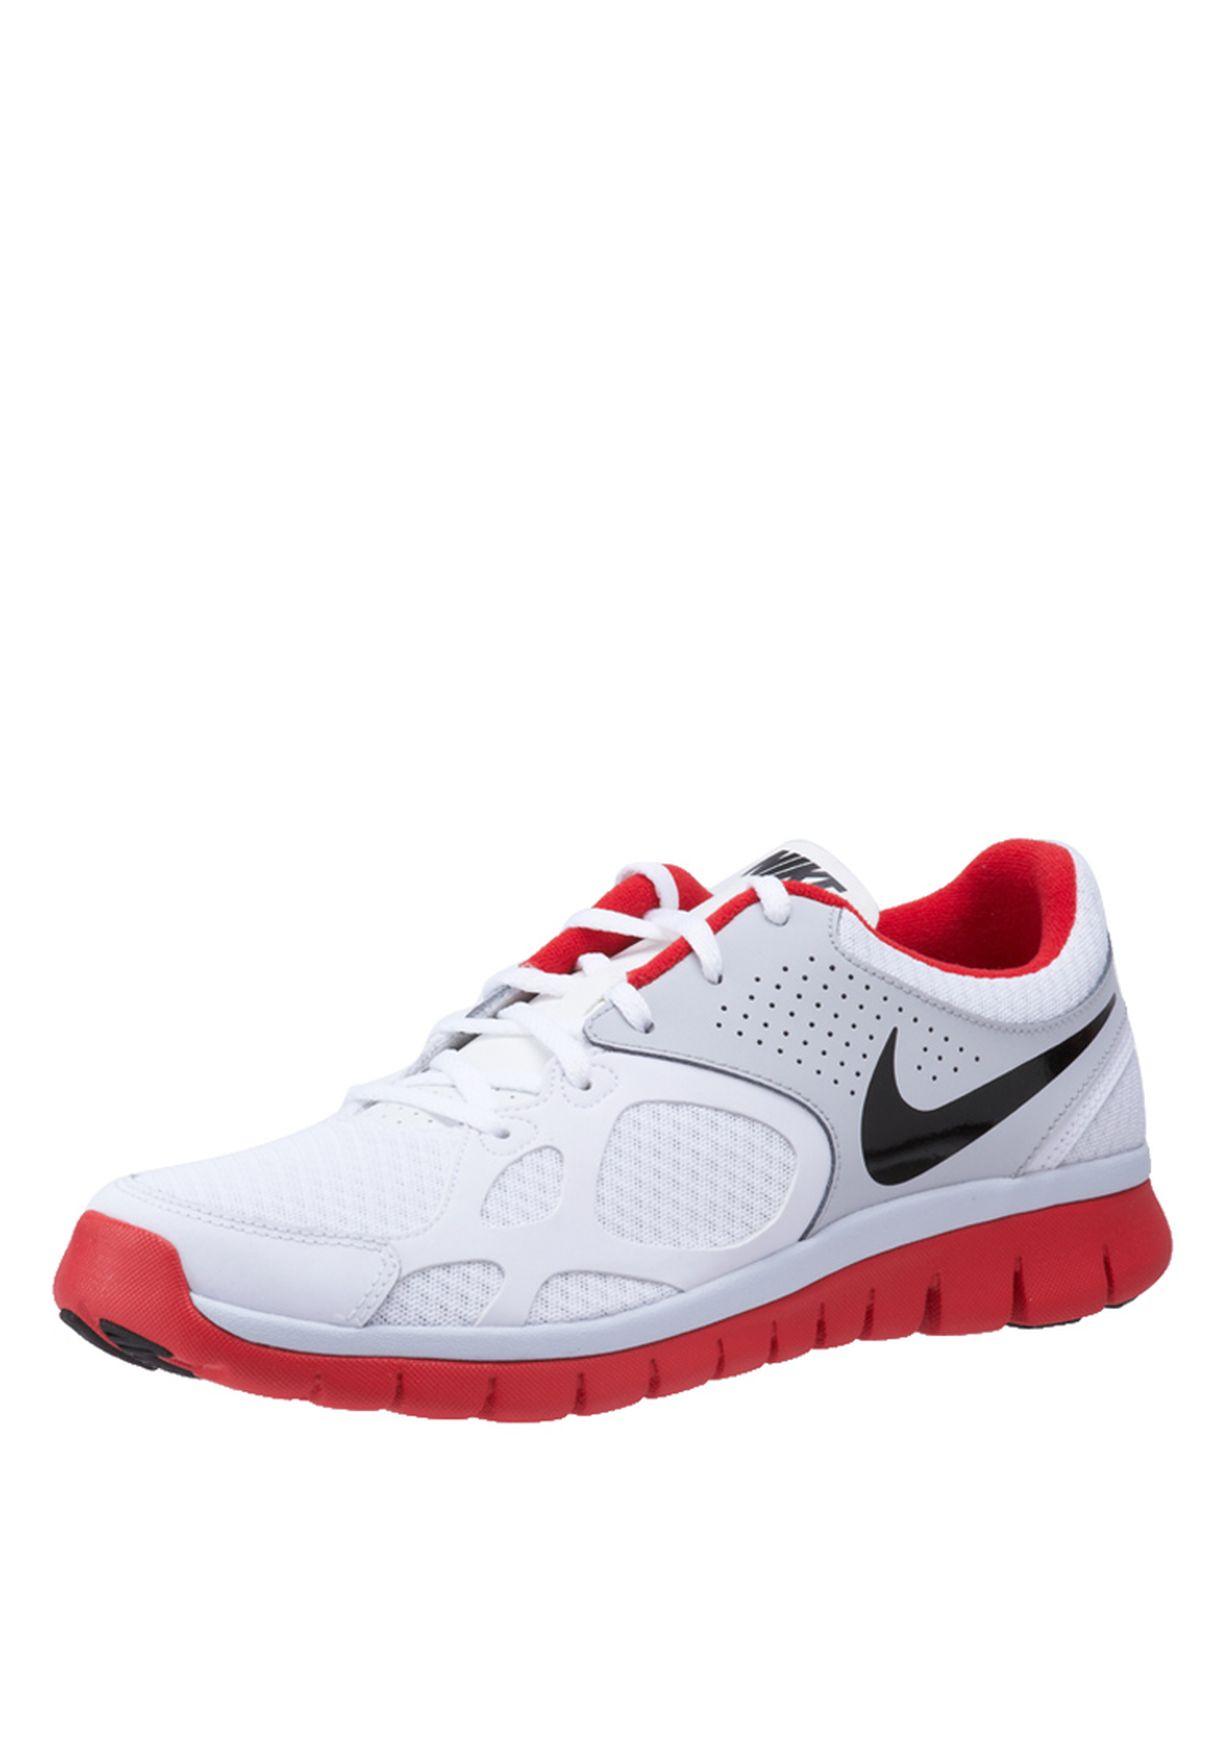 17882848f22f Shop Nike white Flex Rn Trainers 512019-100 for Men in UAE ...